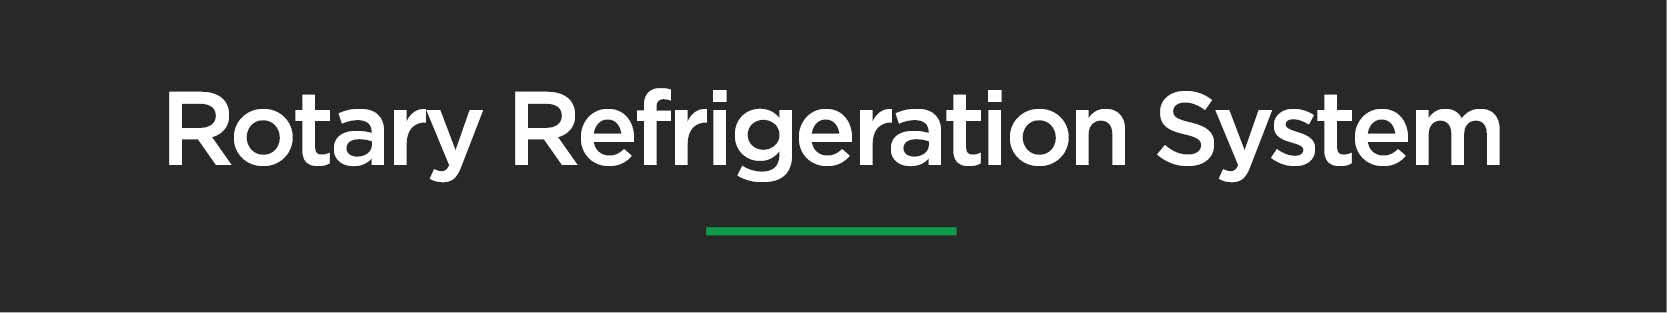 Refrigeration Systems - Rotary